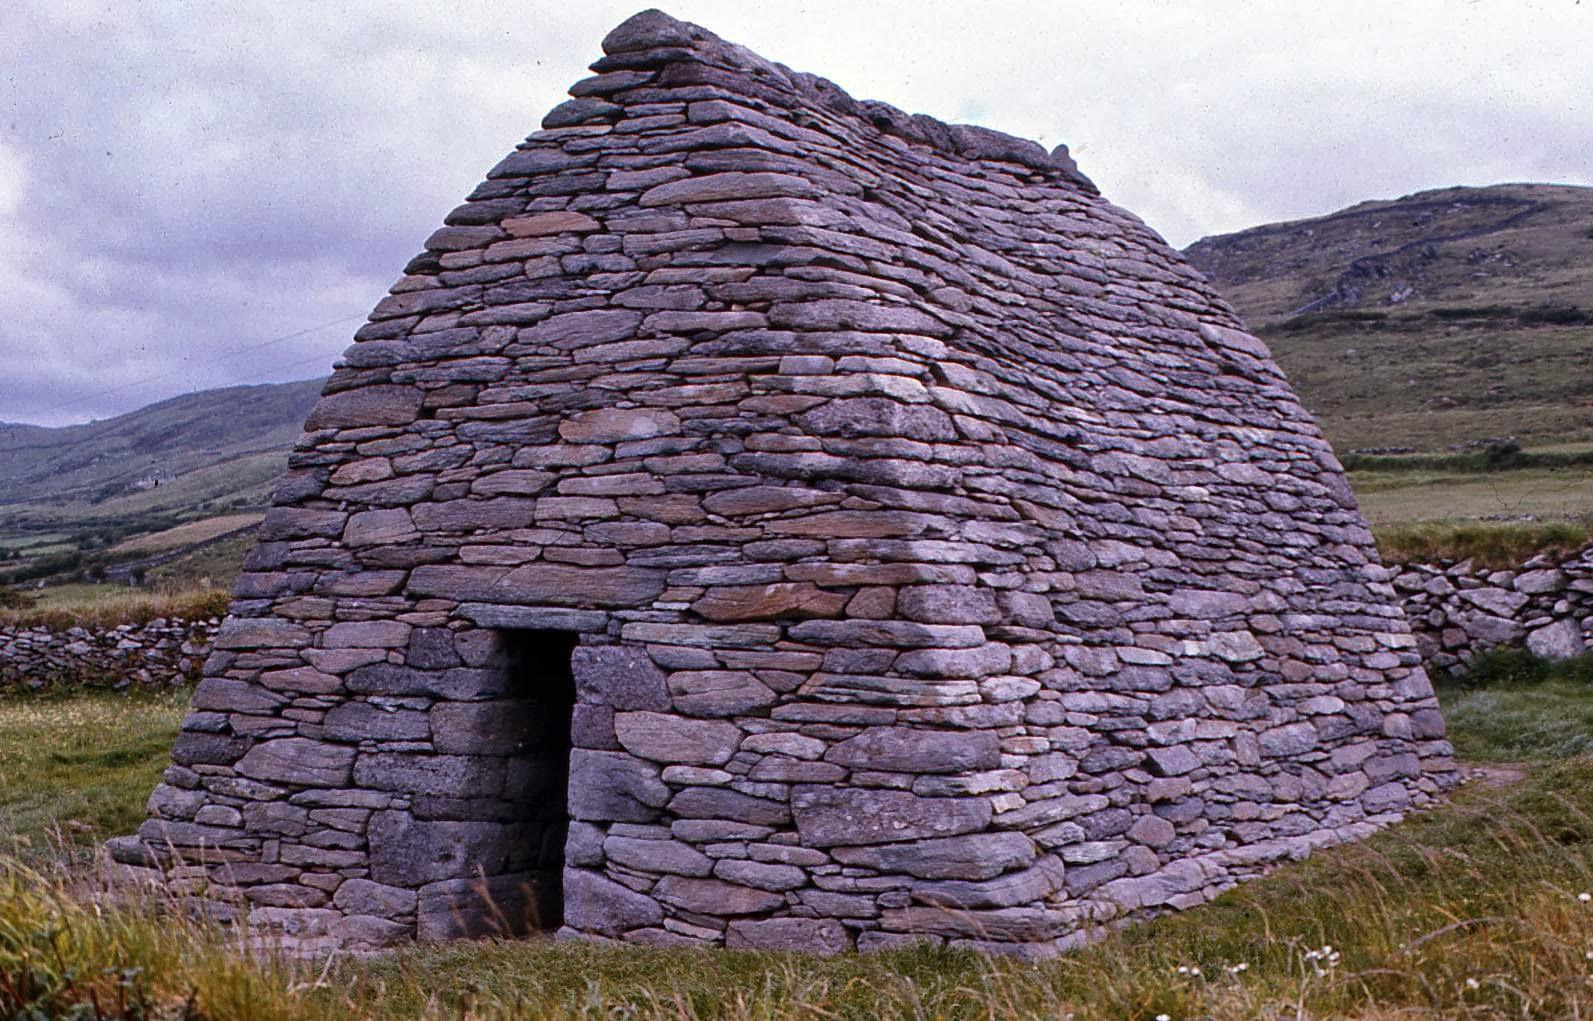 Ireland Stone Building : Fletcher s castoria reddit gallery xxi stones